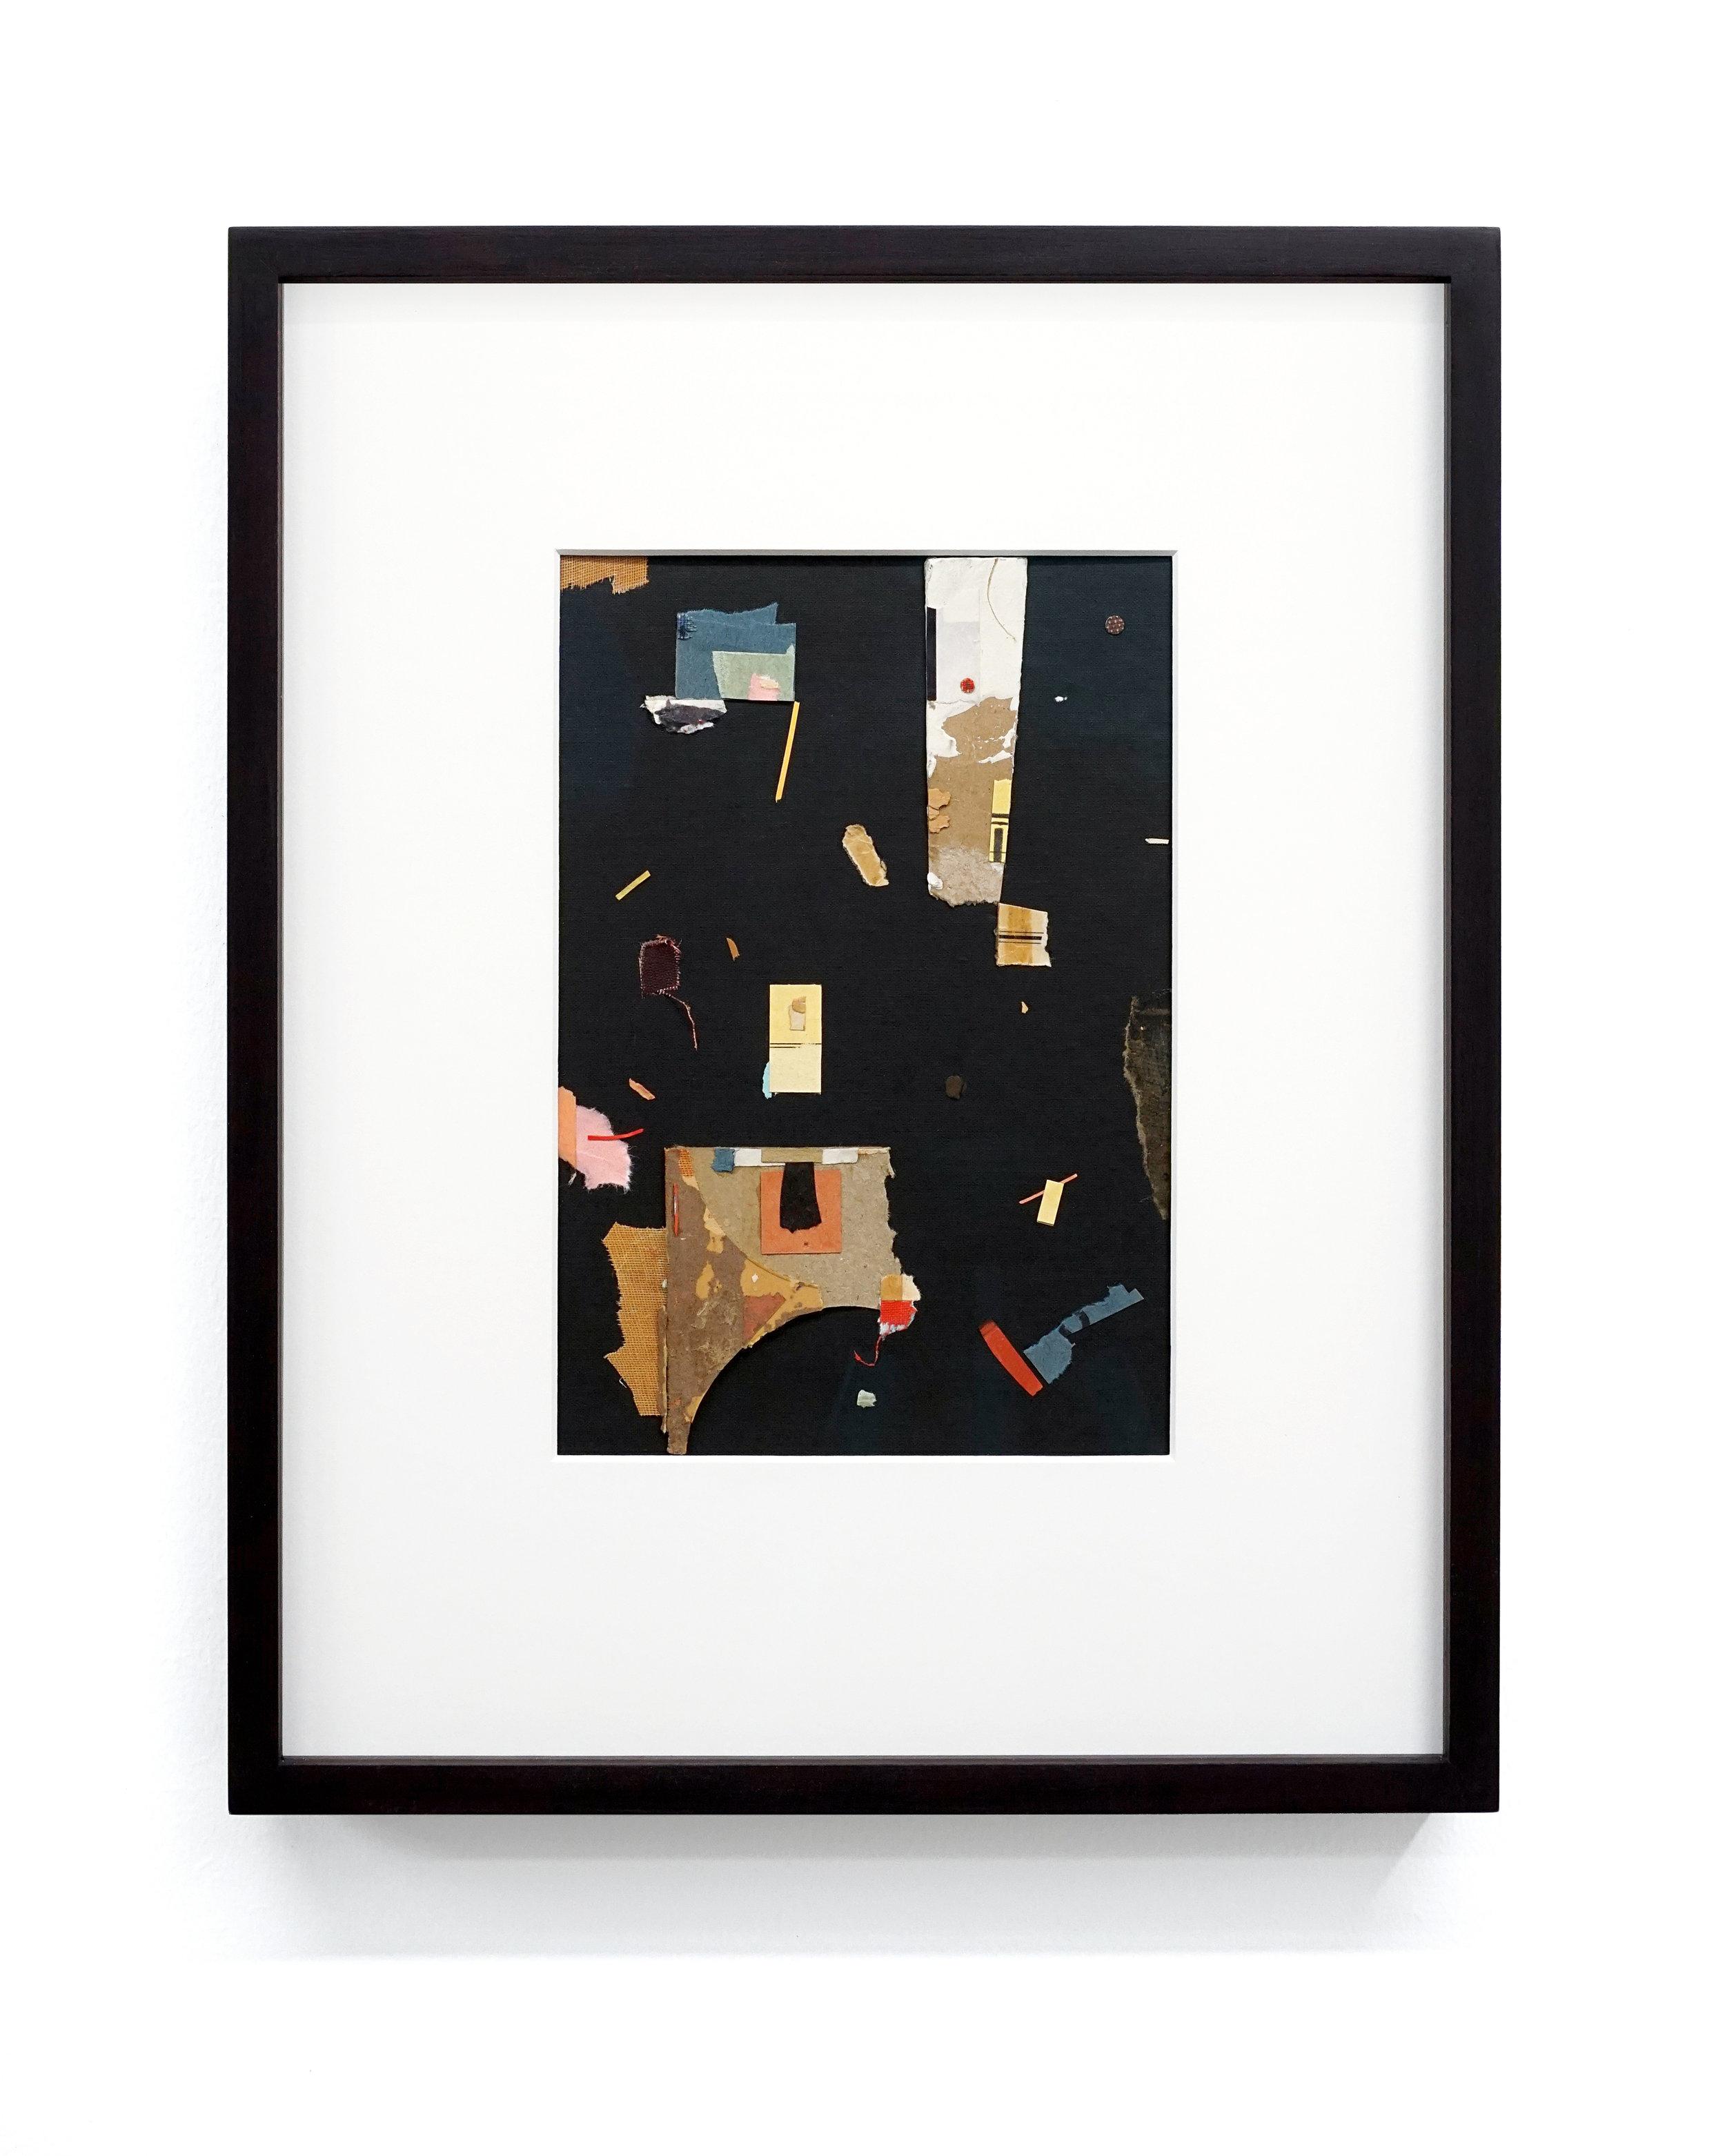 "Jacob Whibley,  oio , 2017, ephemera paper on cardboard,13 x 20 cm (5.5"" x 8"")"